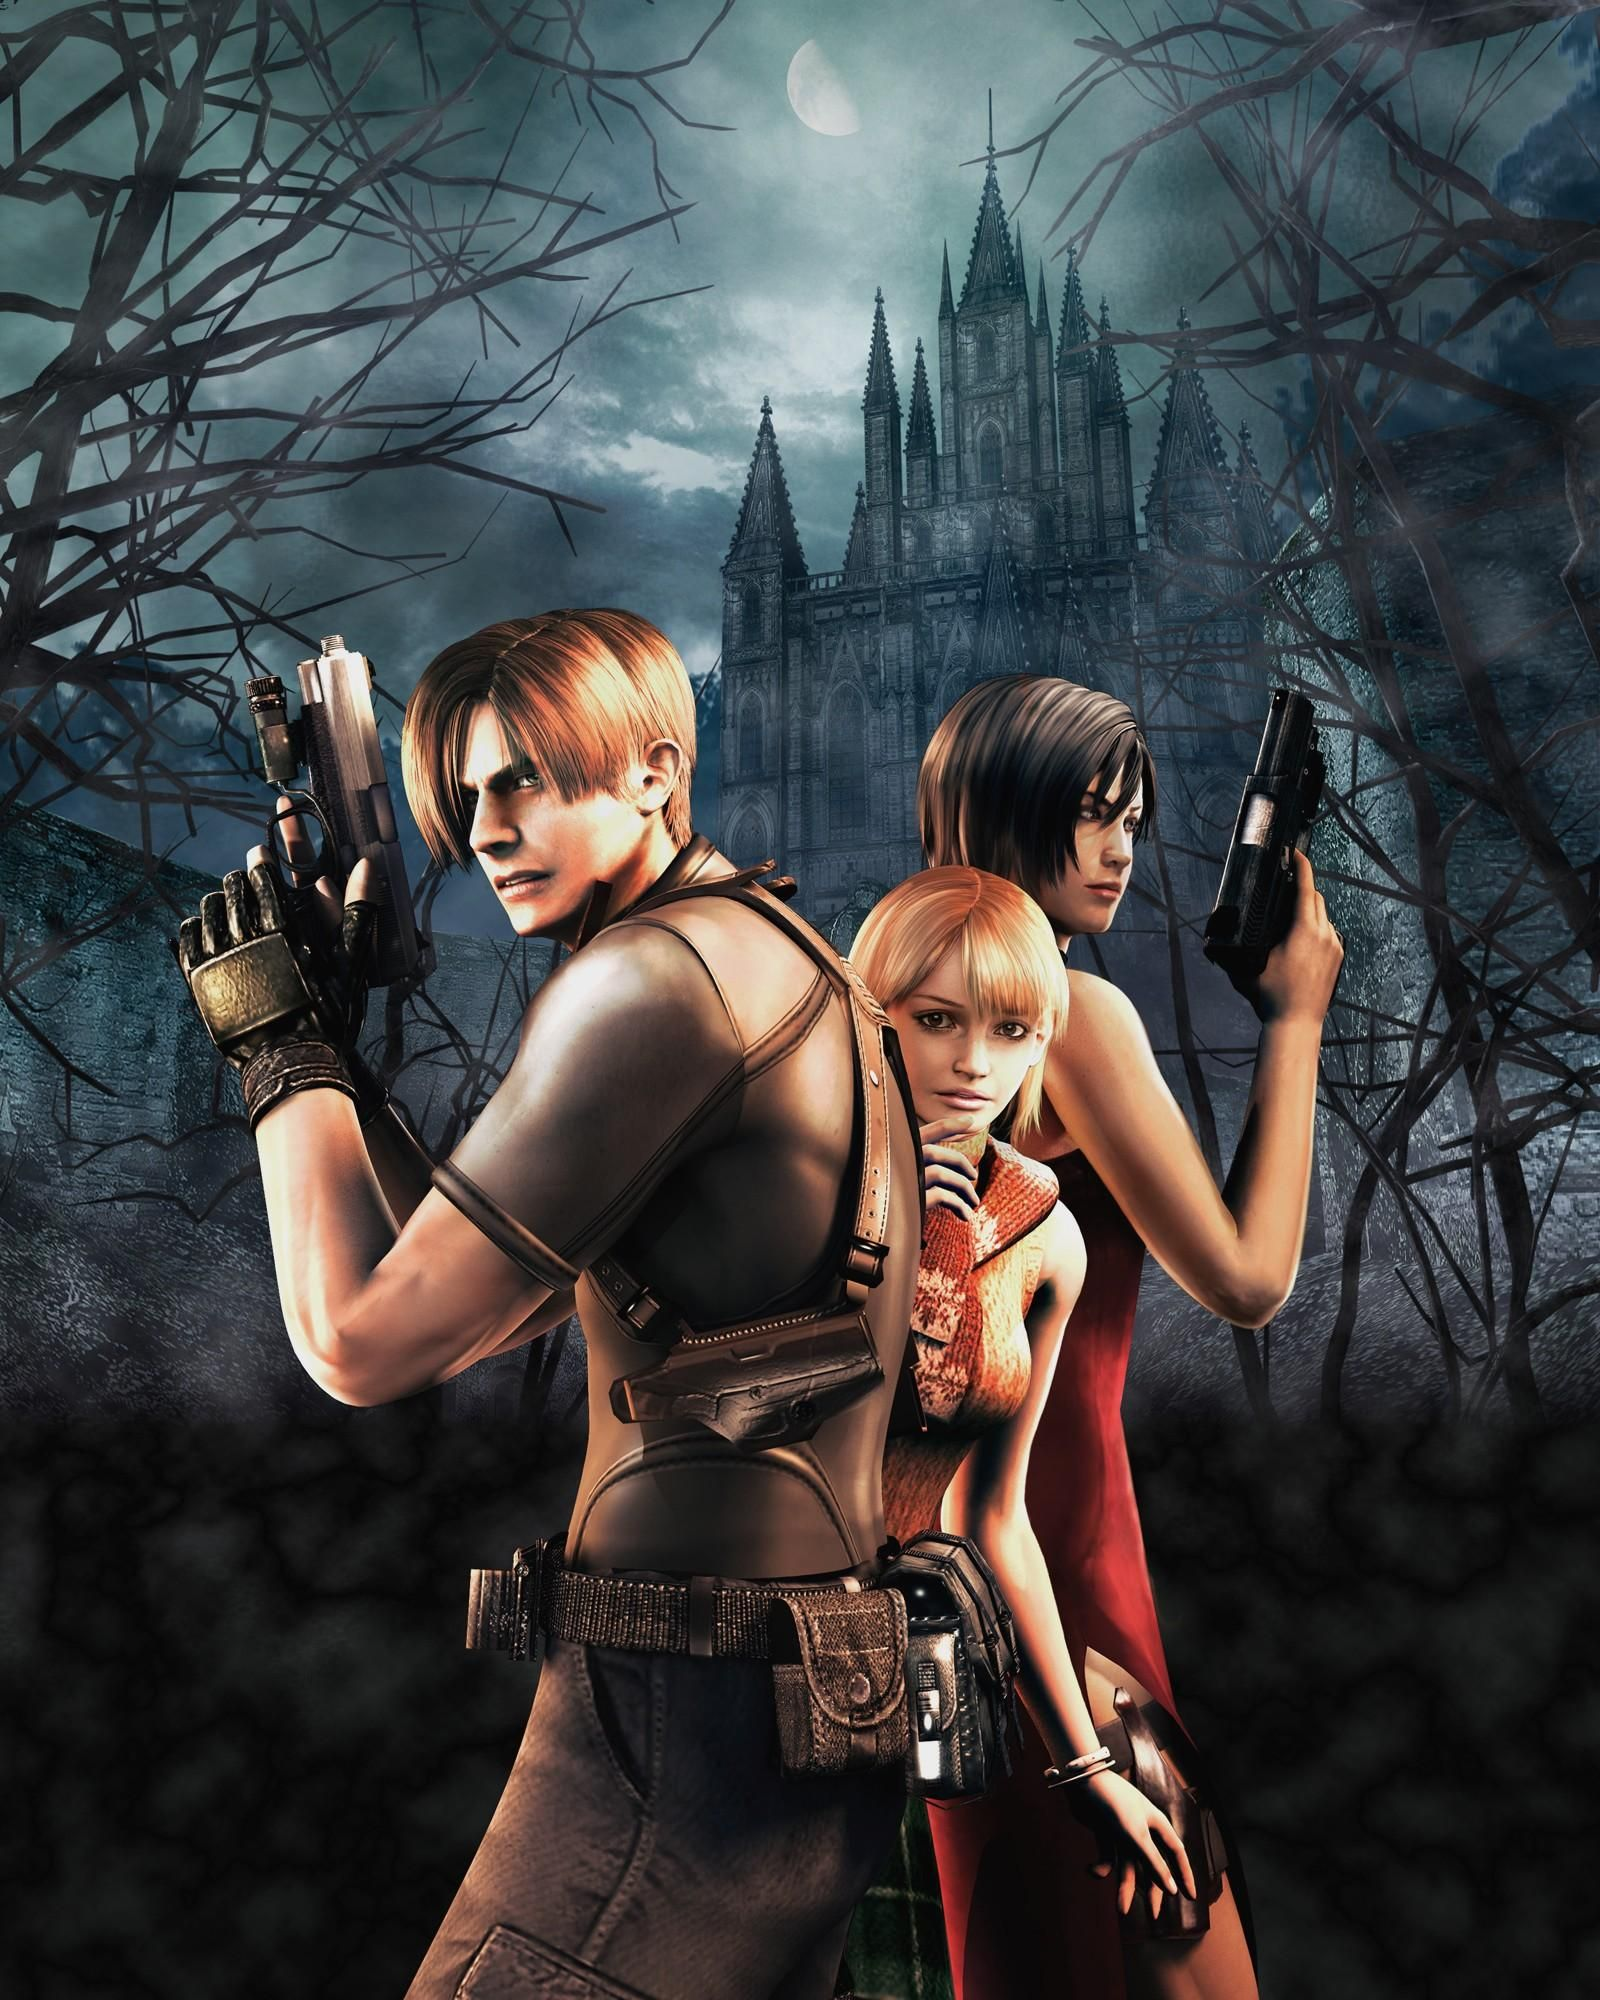 Resident Evil 4 Wallpapers Hd Download Risunki Cherepa Giki